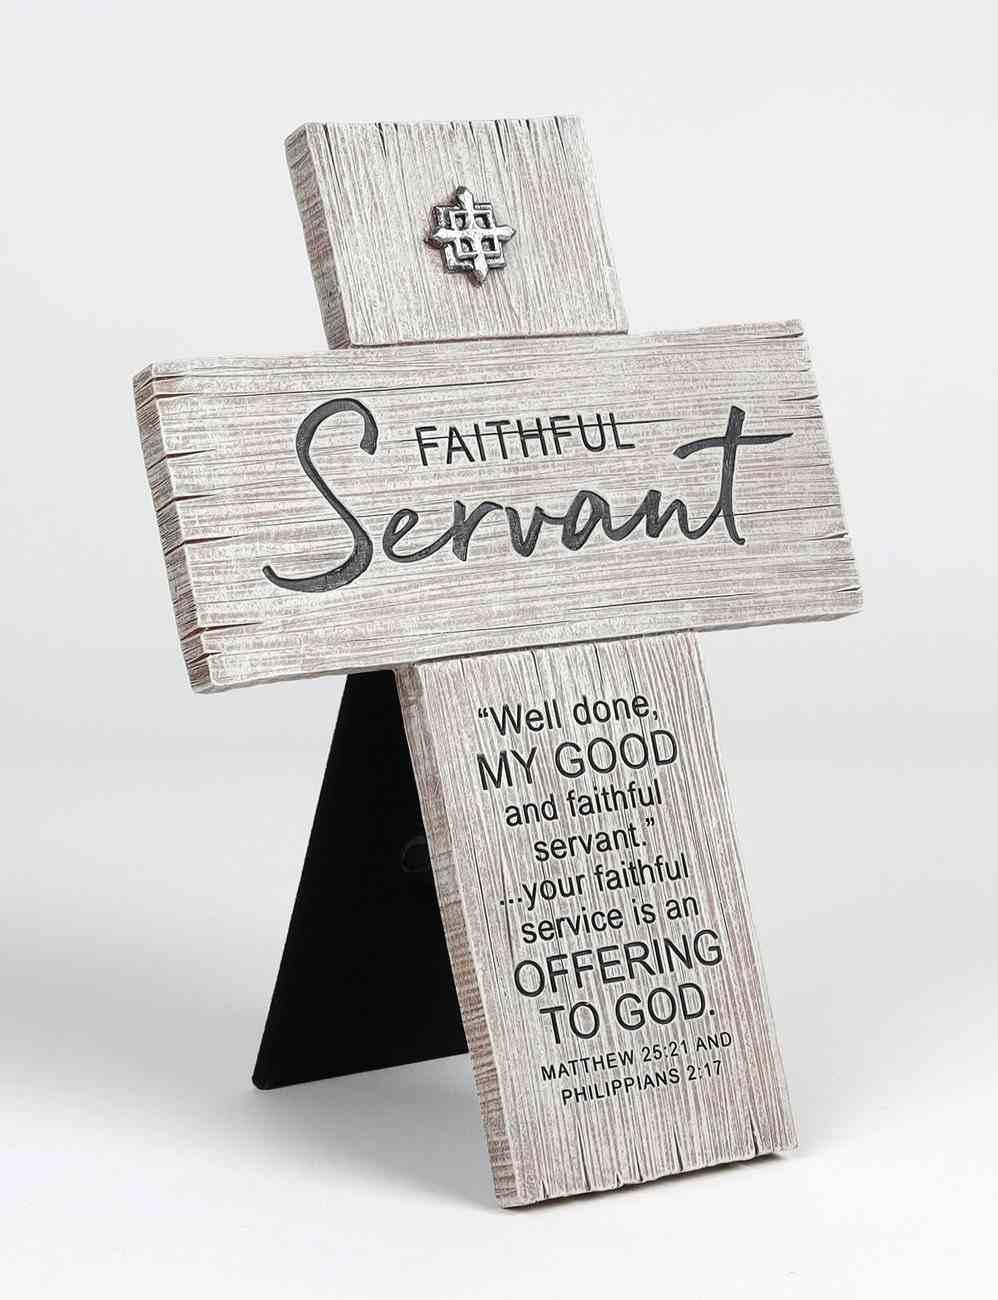 Mdf Wall/Desktop Cross: Faithful Servant, Matthew 25:21 & Philippians 2:17 Plaque